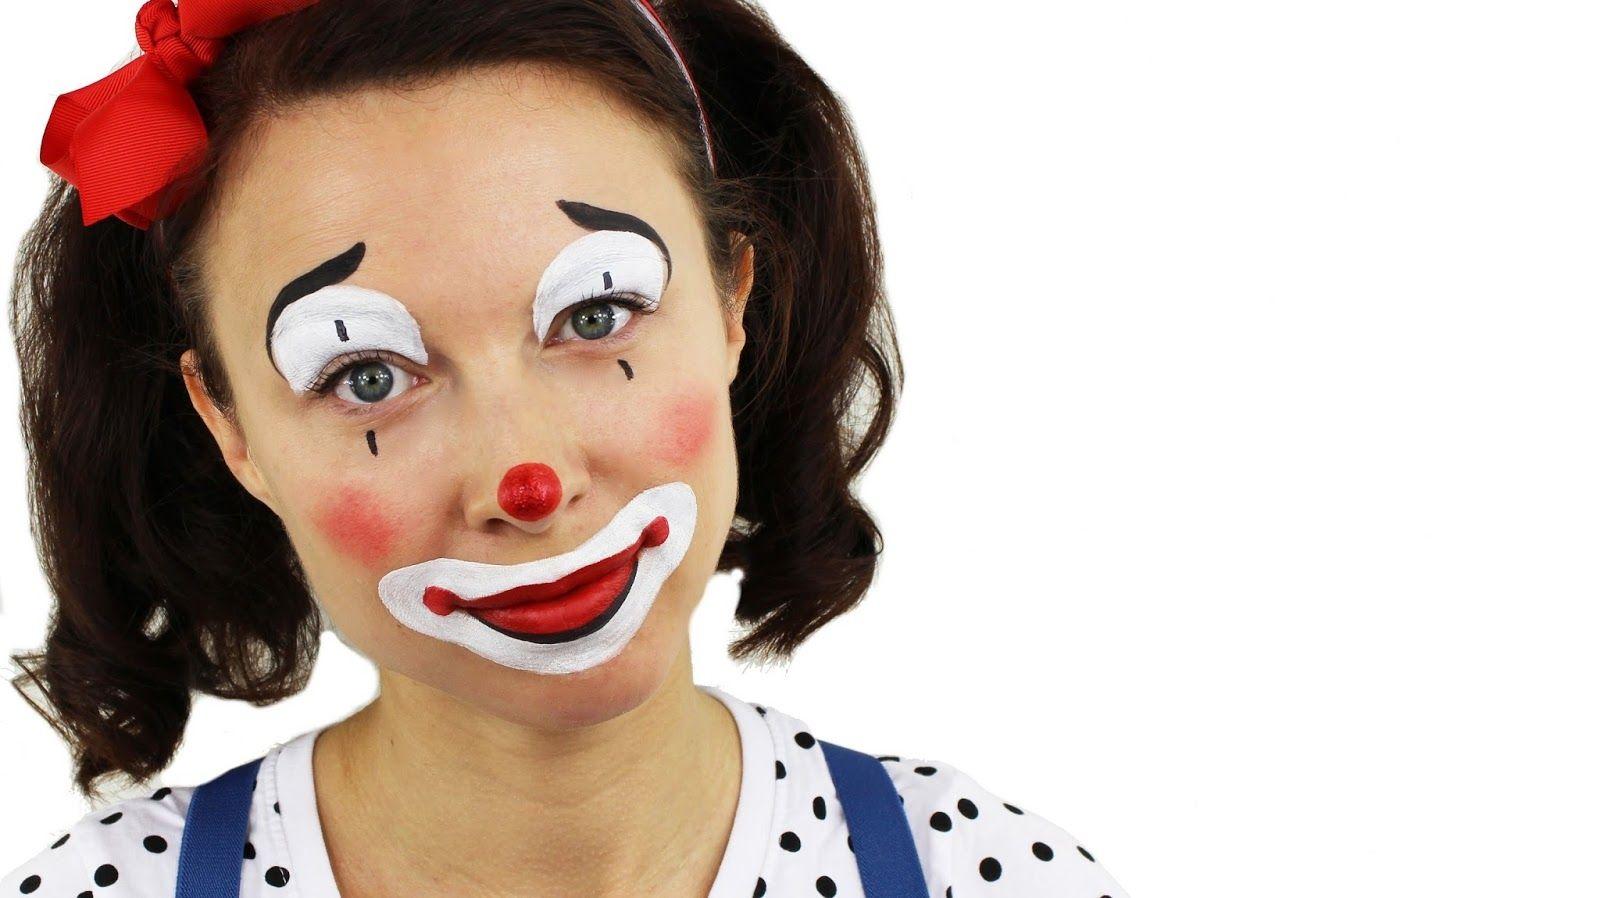 pin von kerri smith auf fun stuff clown schminken kind. Black Bedroom Furniture Sets. Home Design Ideas